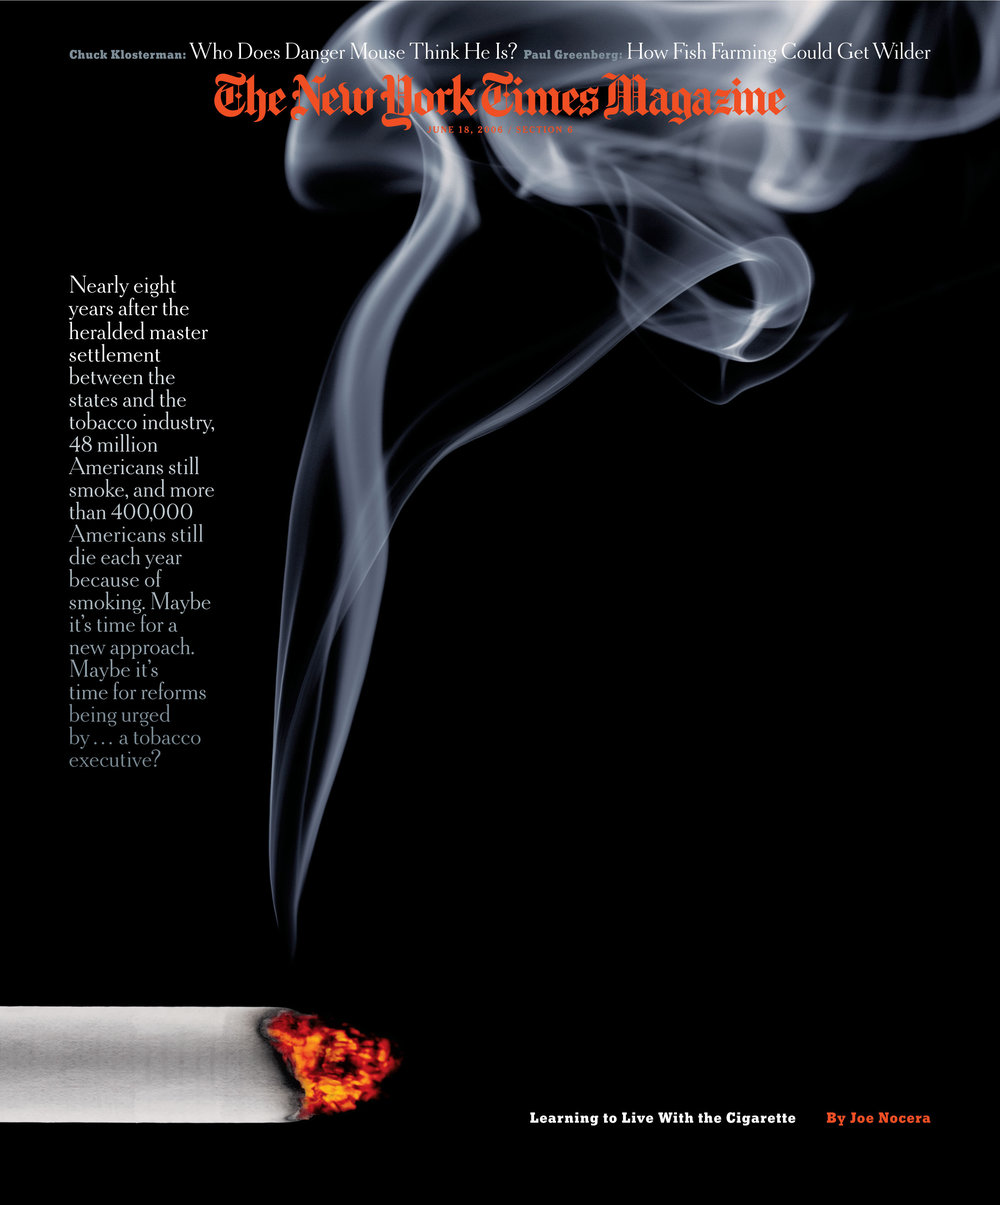 COVER.06.18.06.Cigarette Cover.jpg